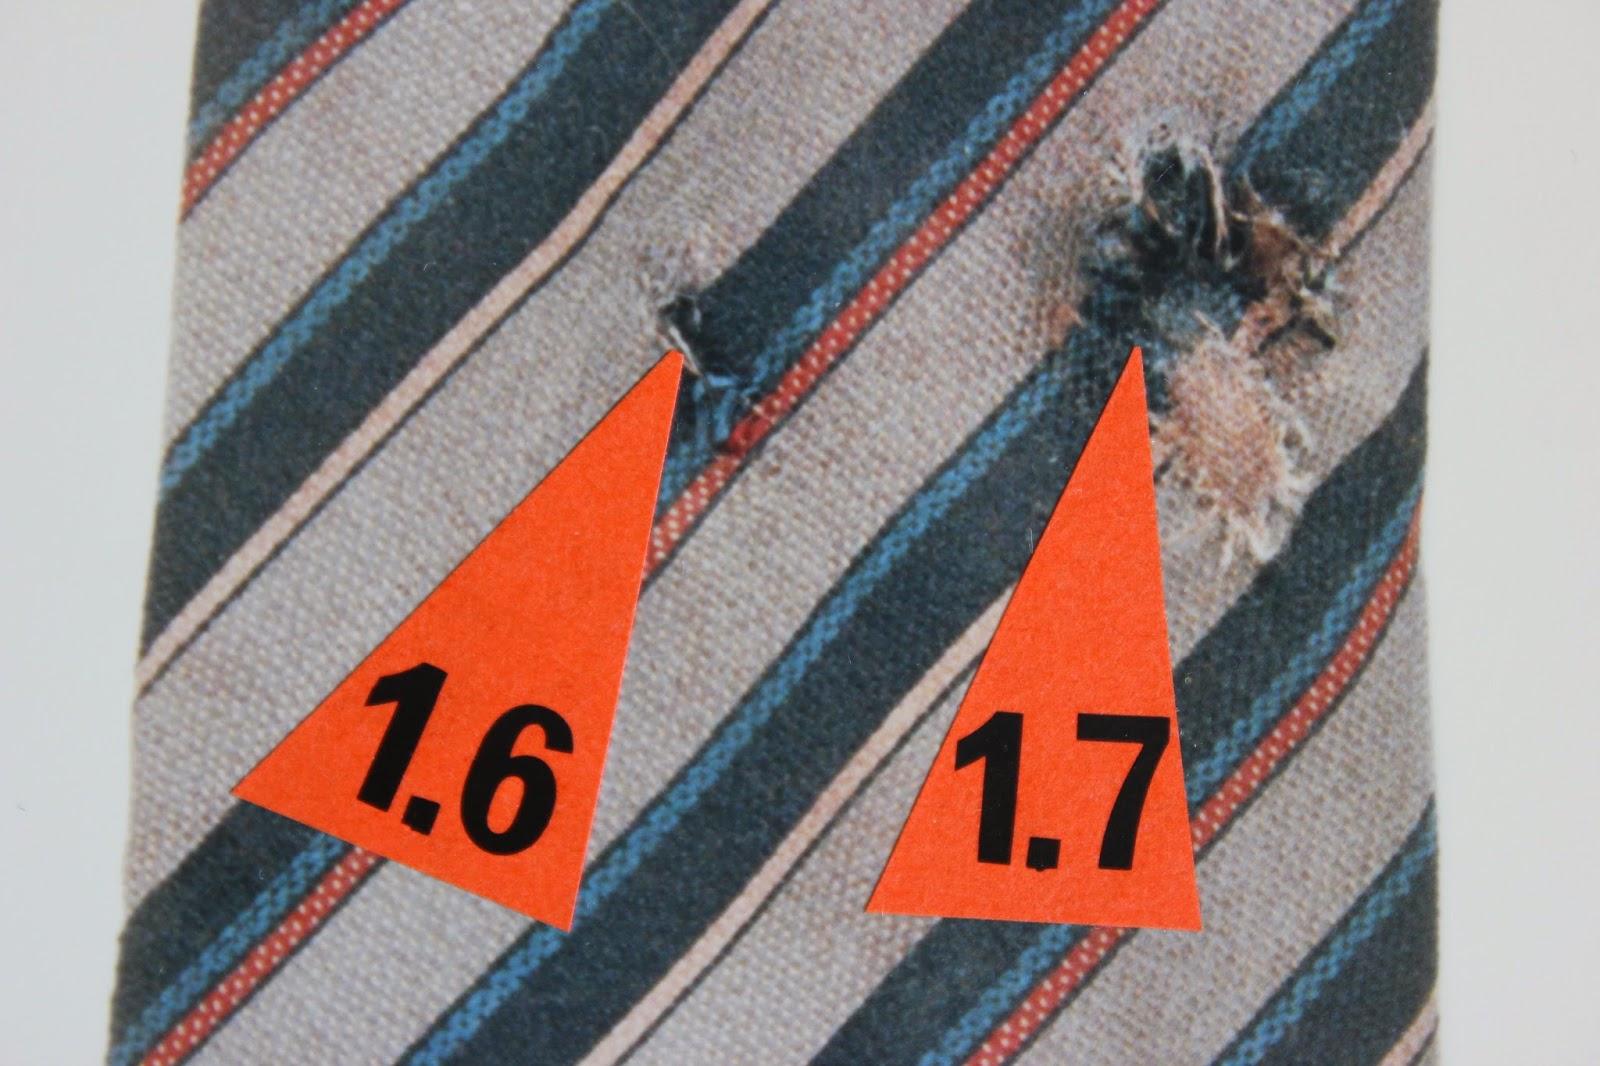 Olof Palmes slips 6